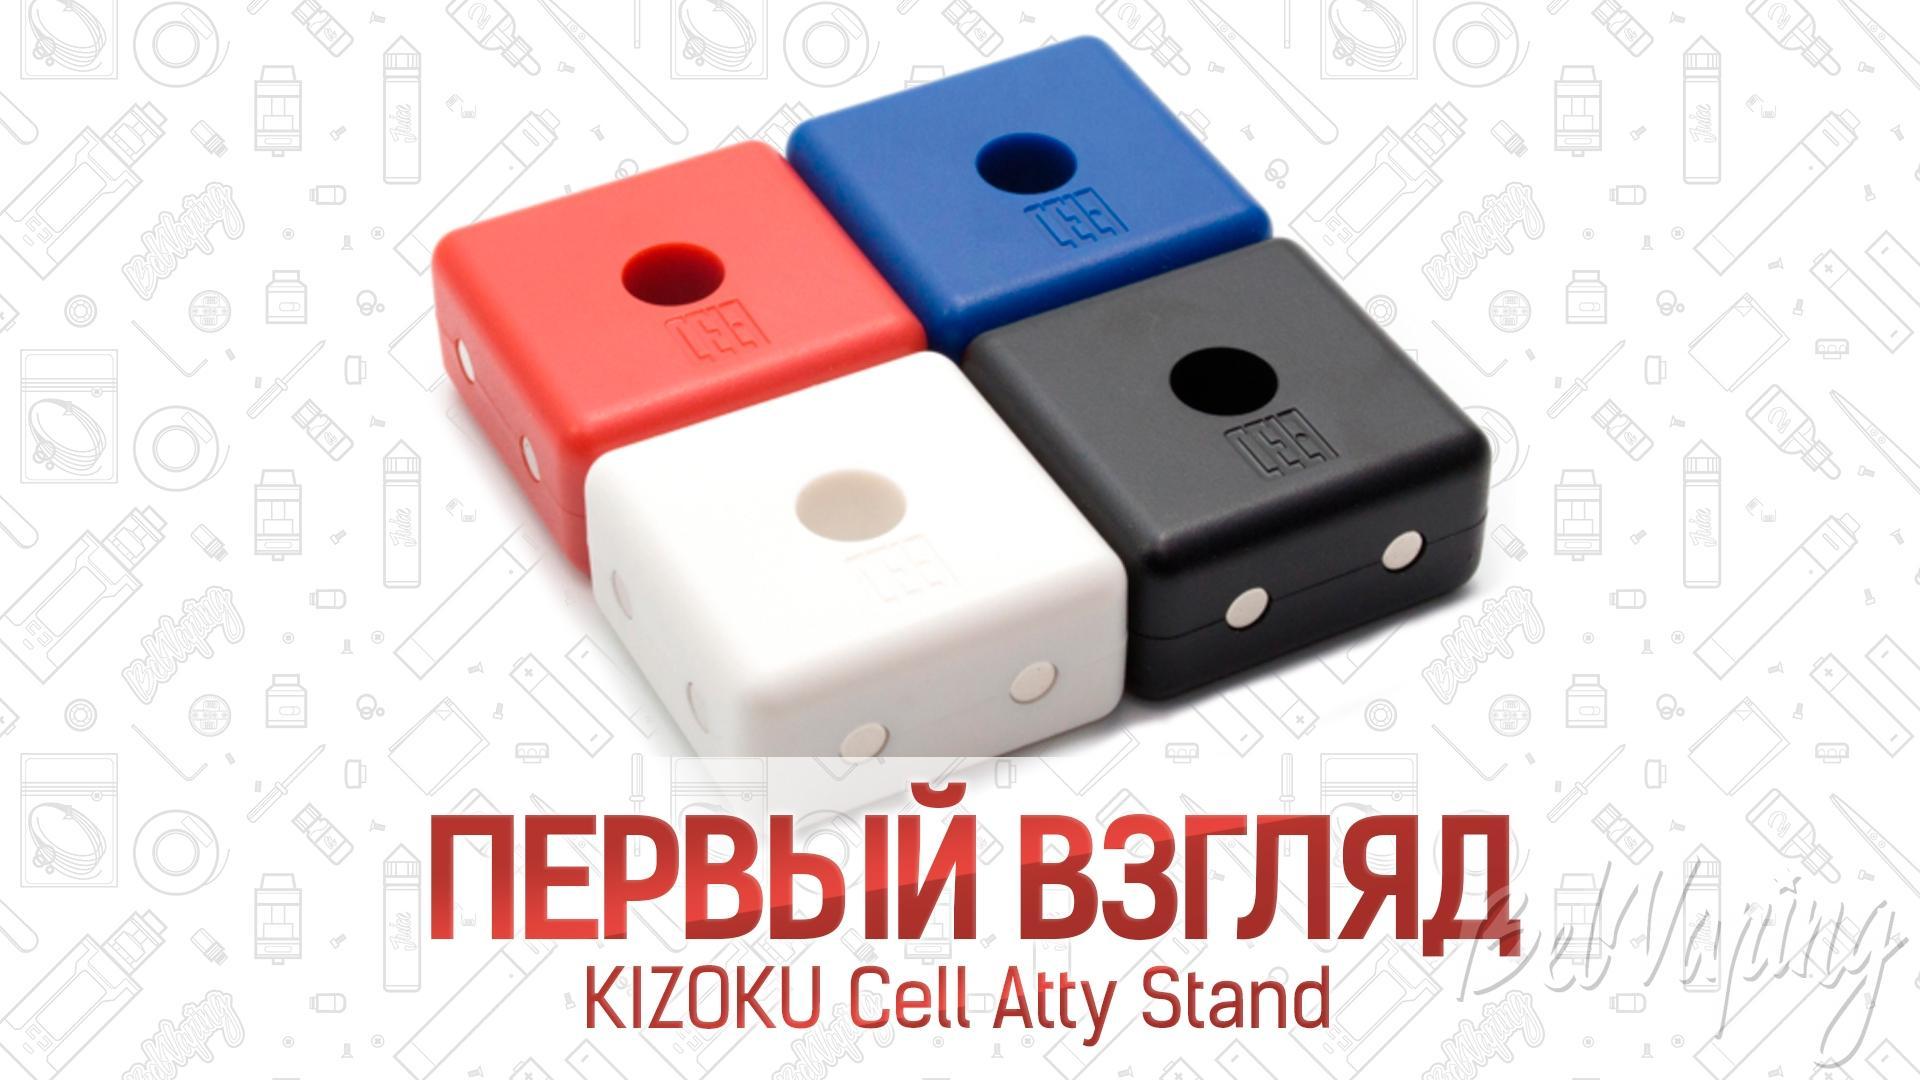 KIZOKU Cell Atty Stand. Первый взгляд